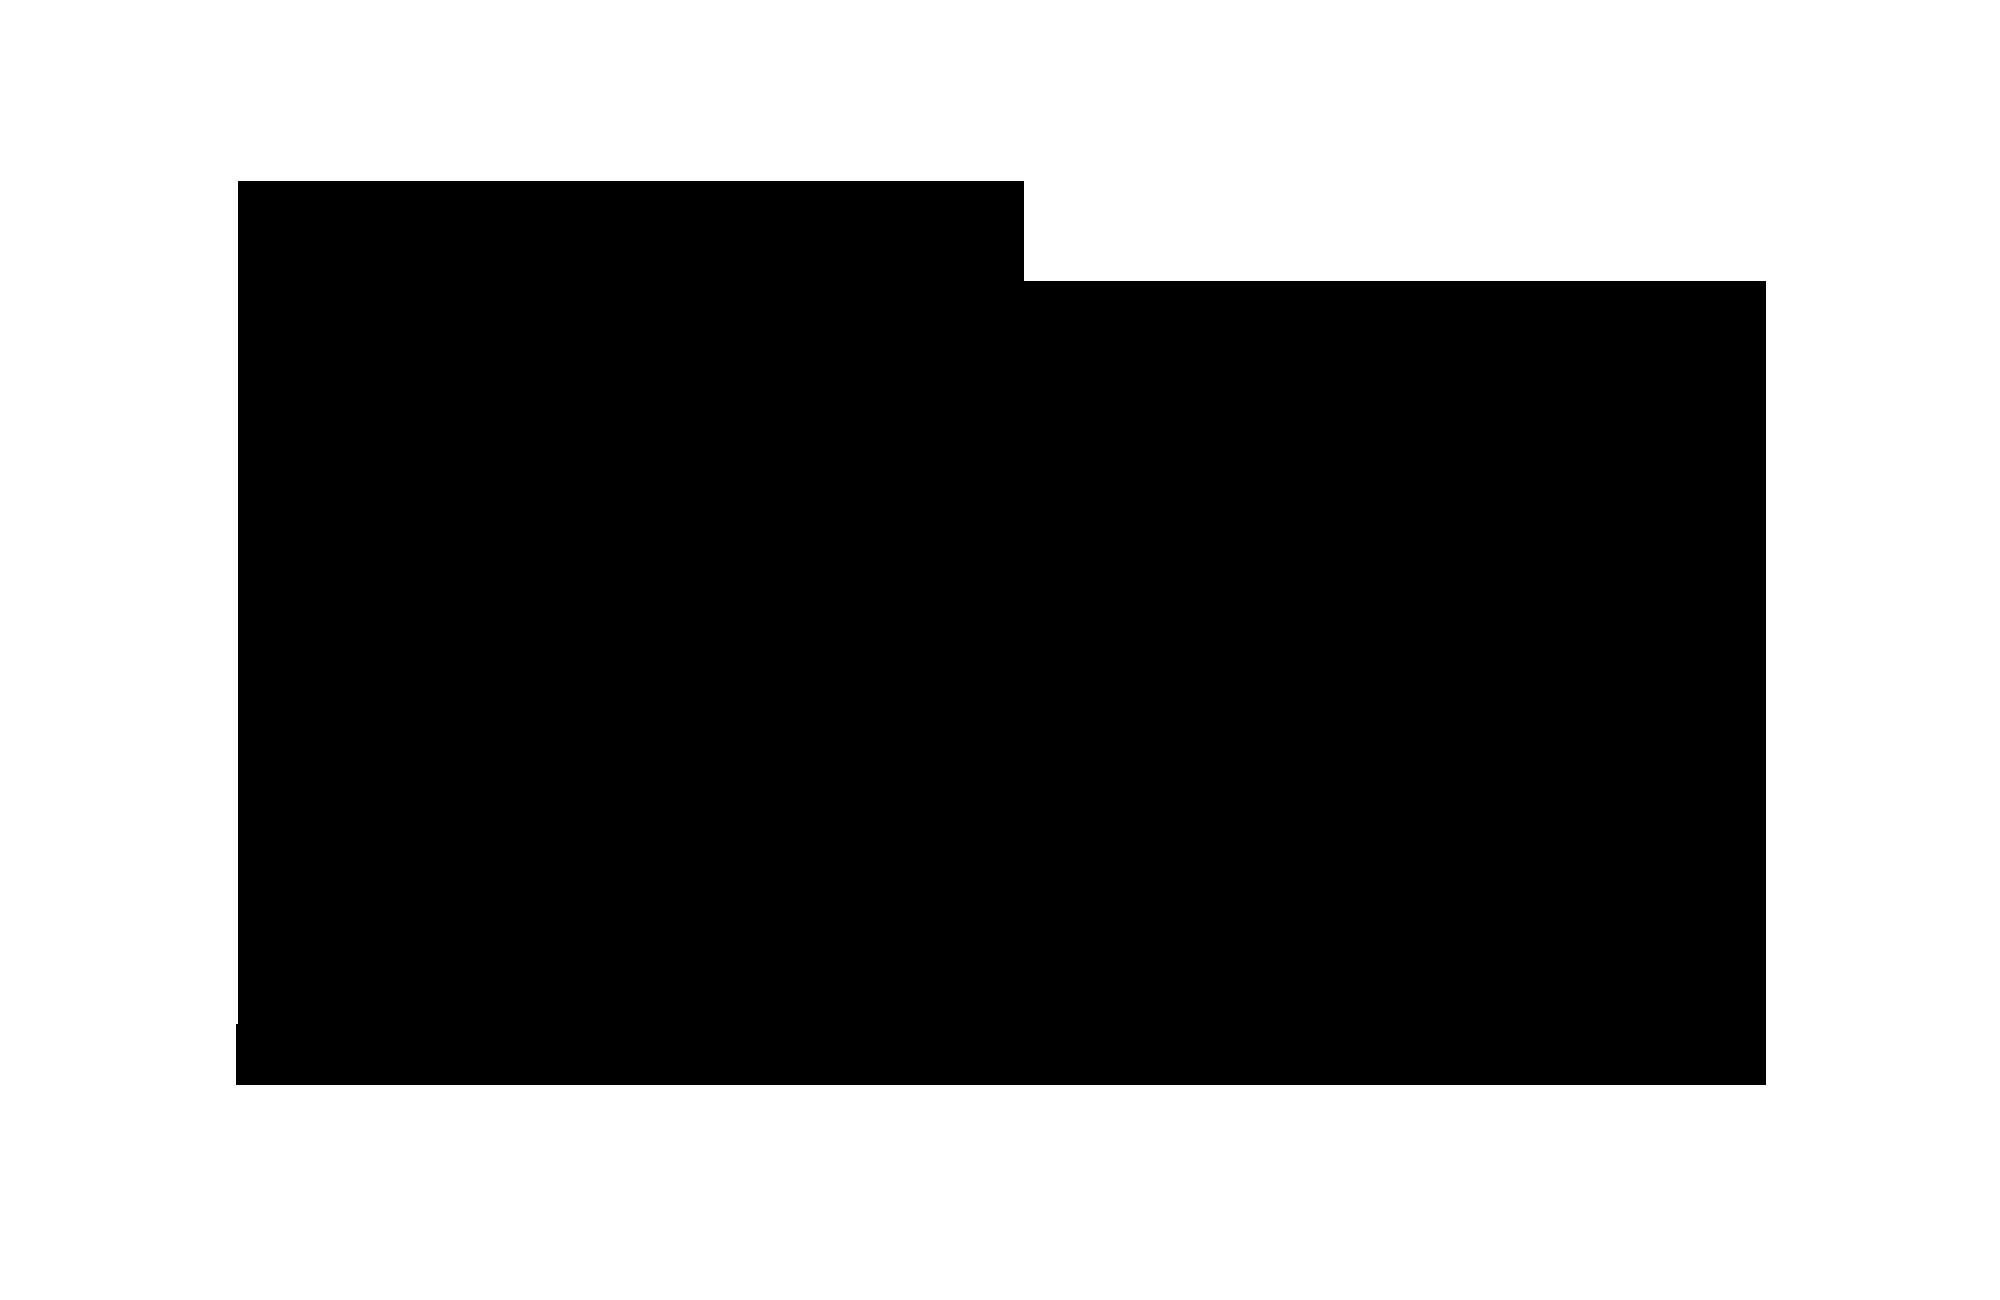 SC_logo_HD_transp-2.png